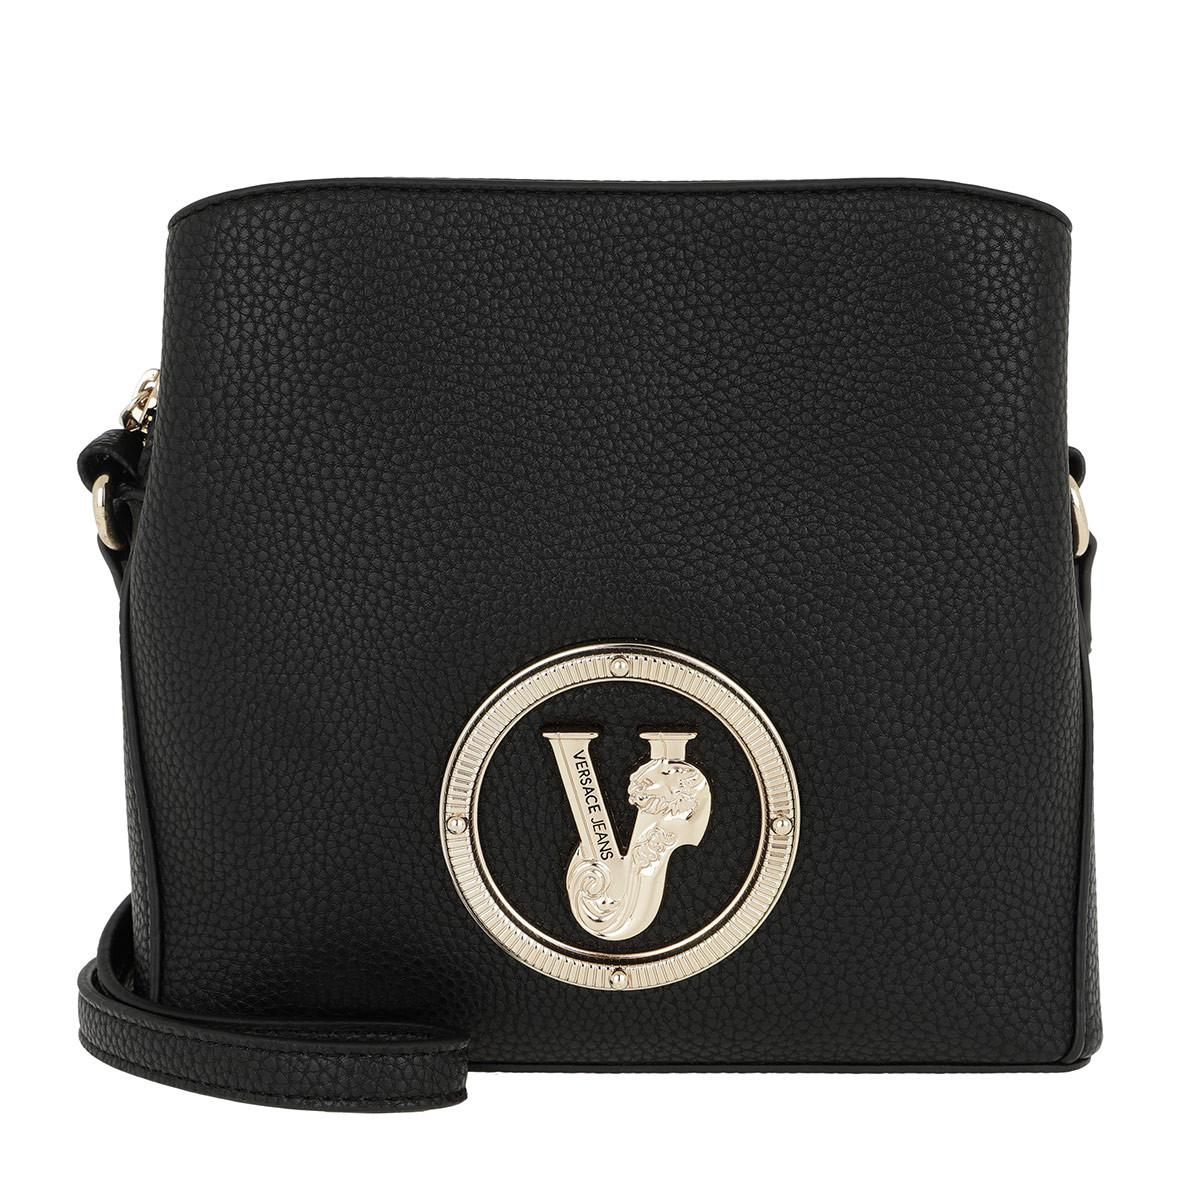 Versace Jeans Logo Mini Bucket Bag Black in Black - Lyst dd4c9defe8